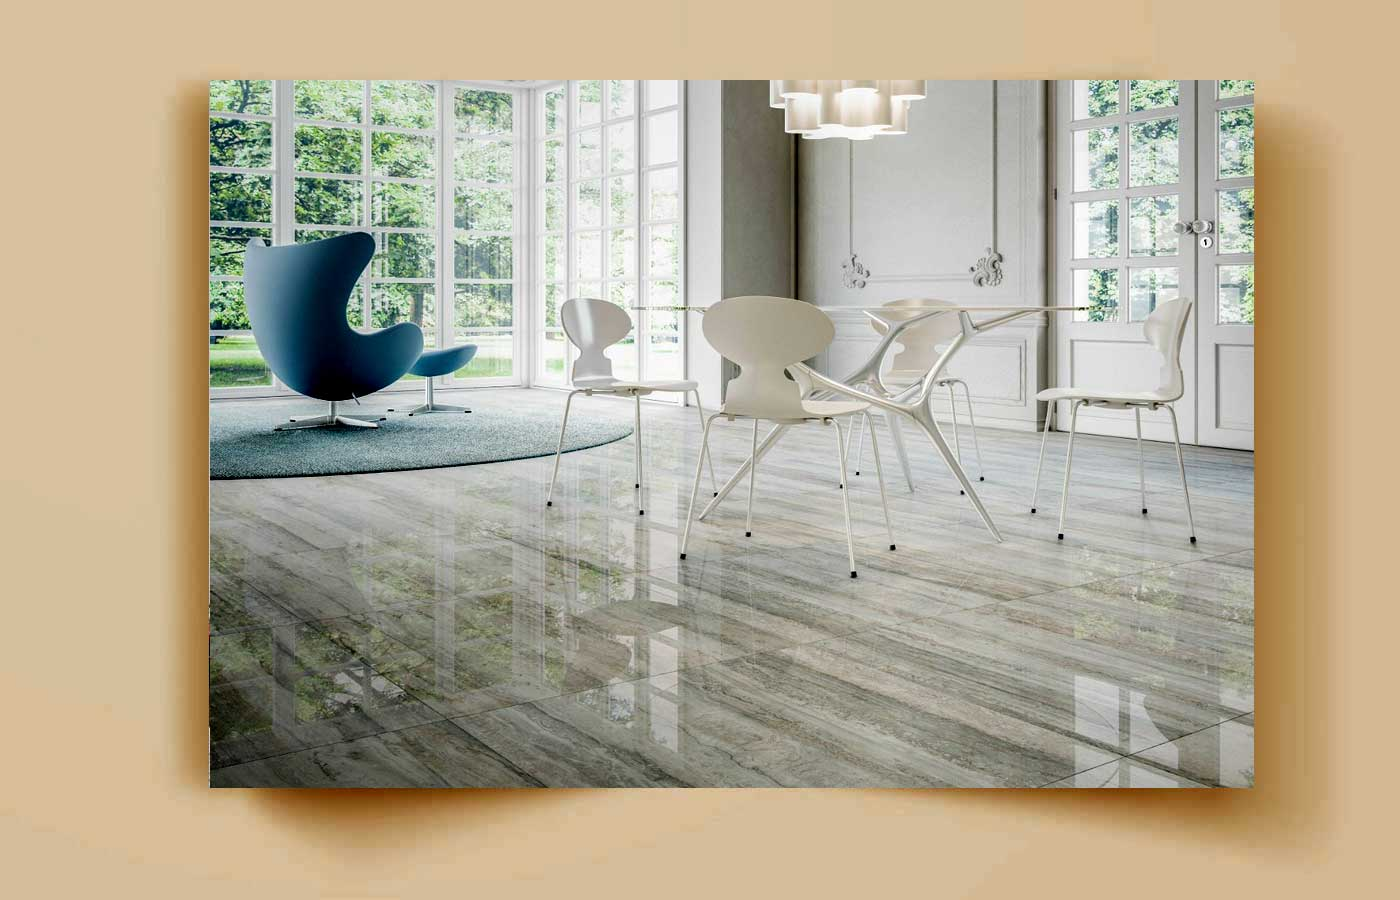 Floor Covering 09 - کف و کف پوش در طراحی داخلی